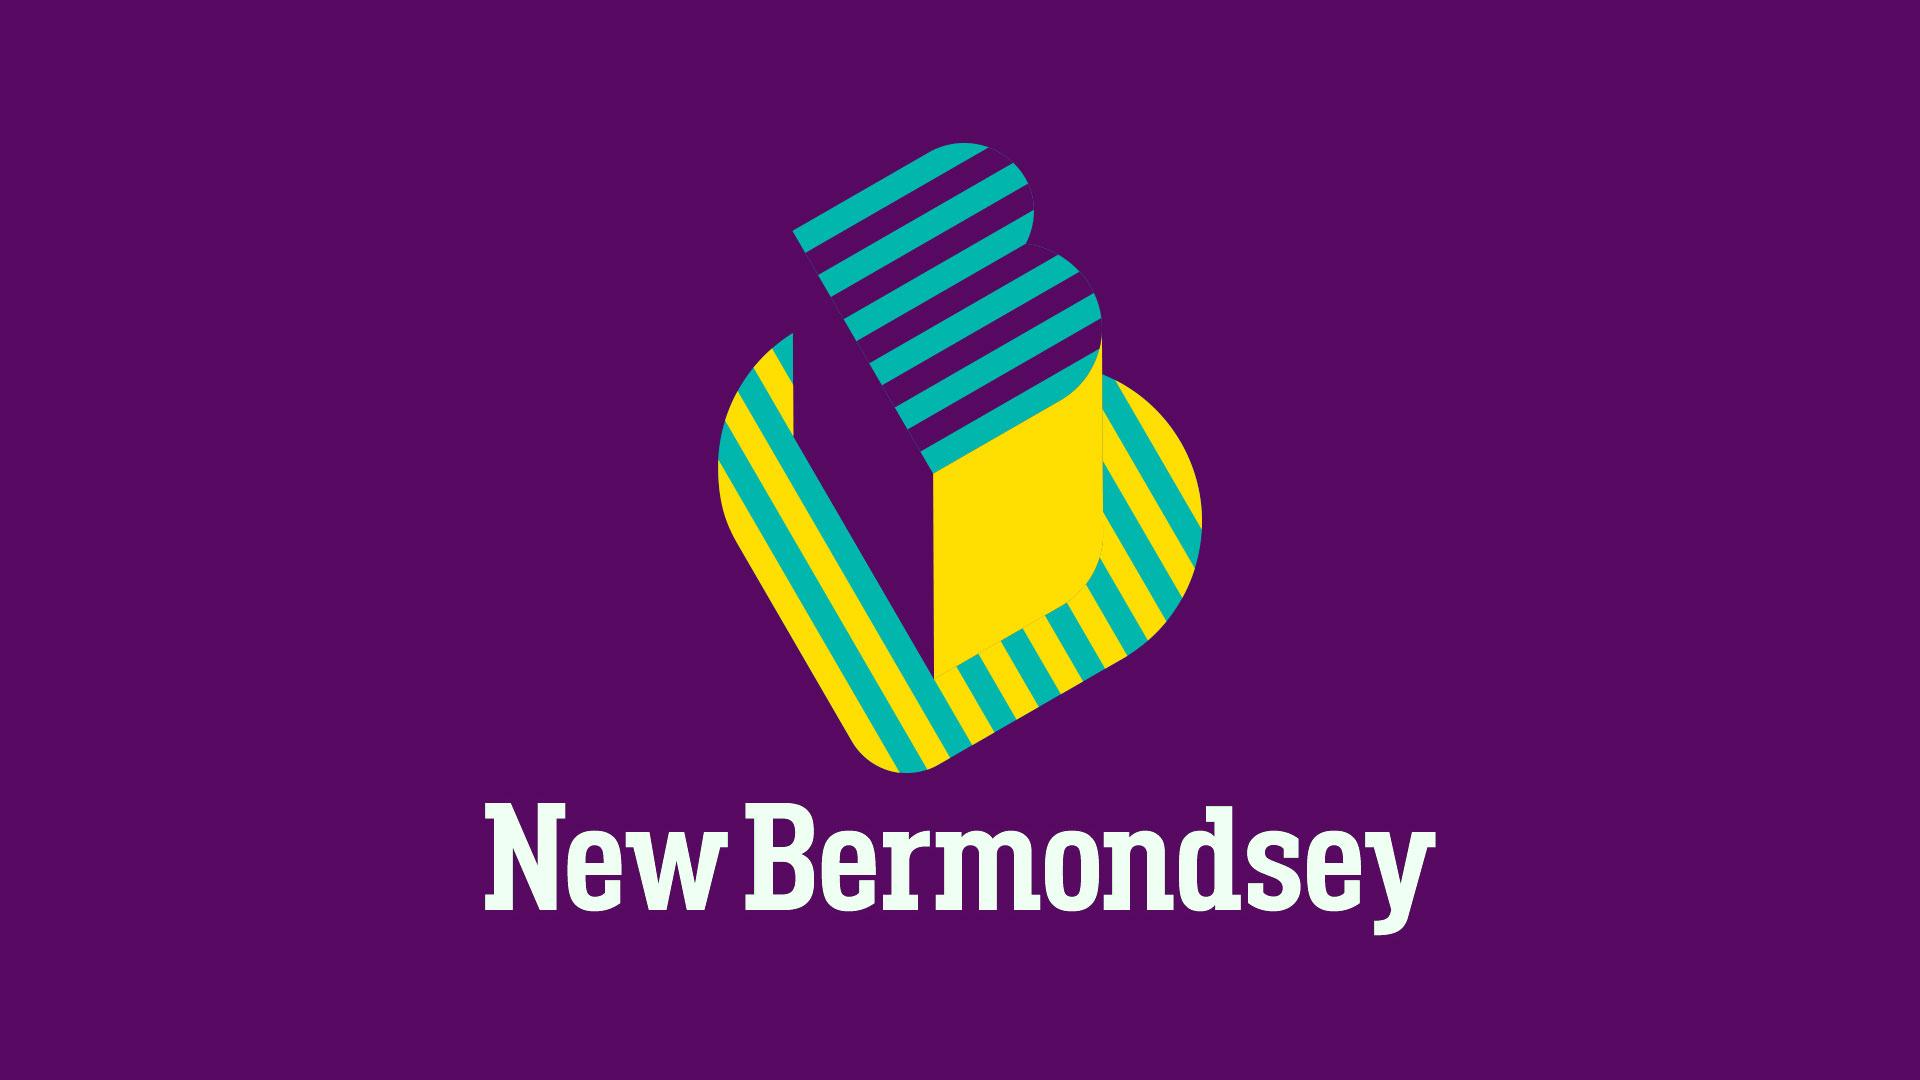 new bermondsey logo design brand identity brand naming